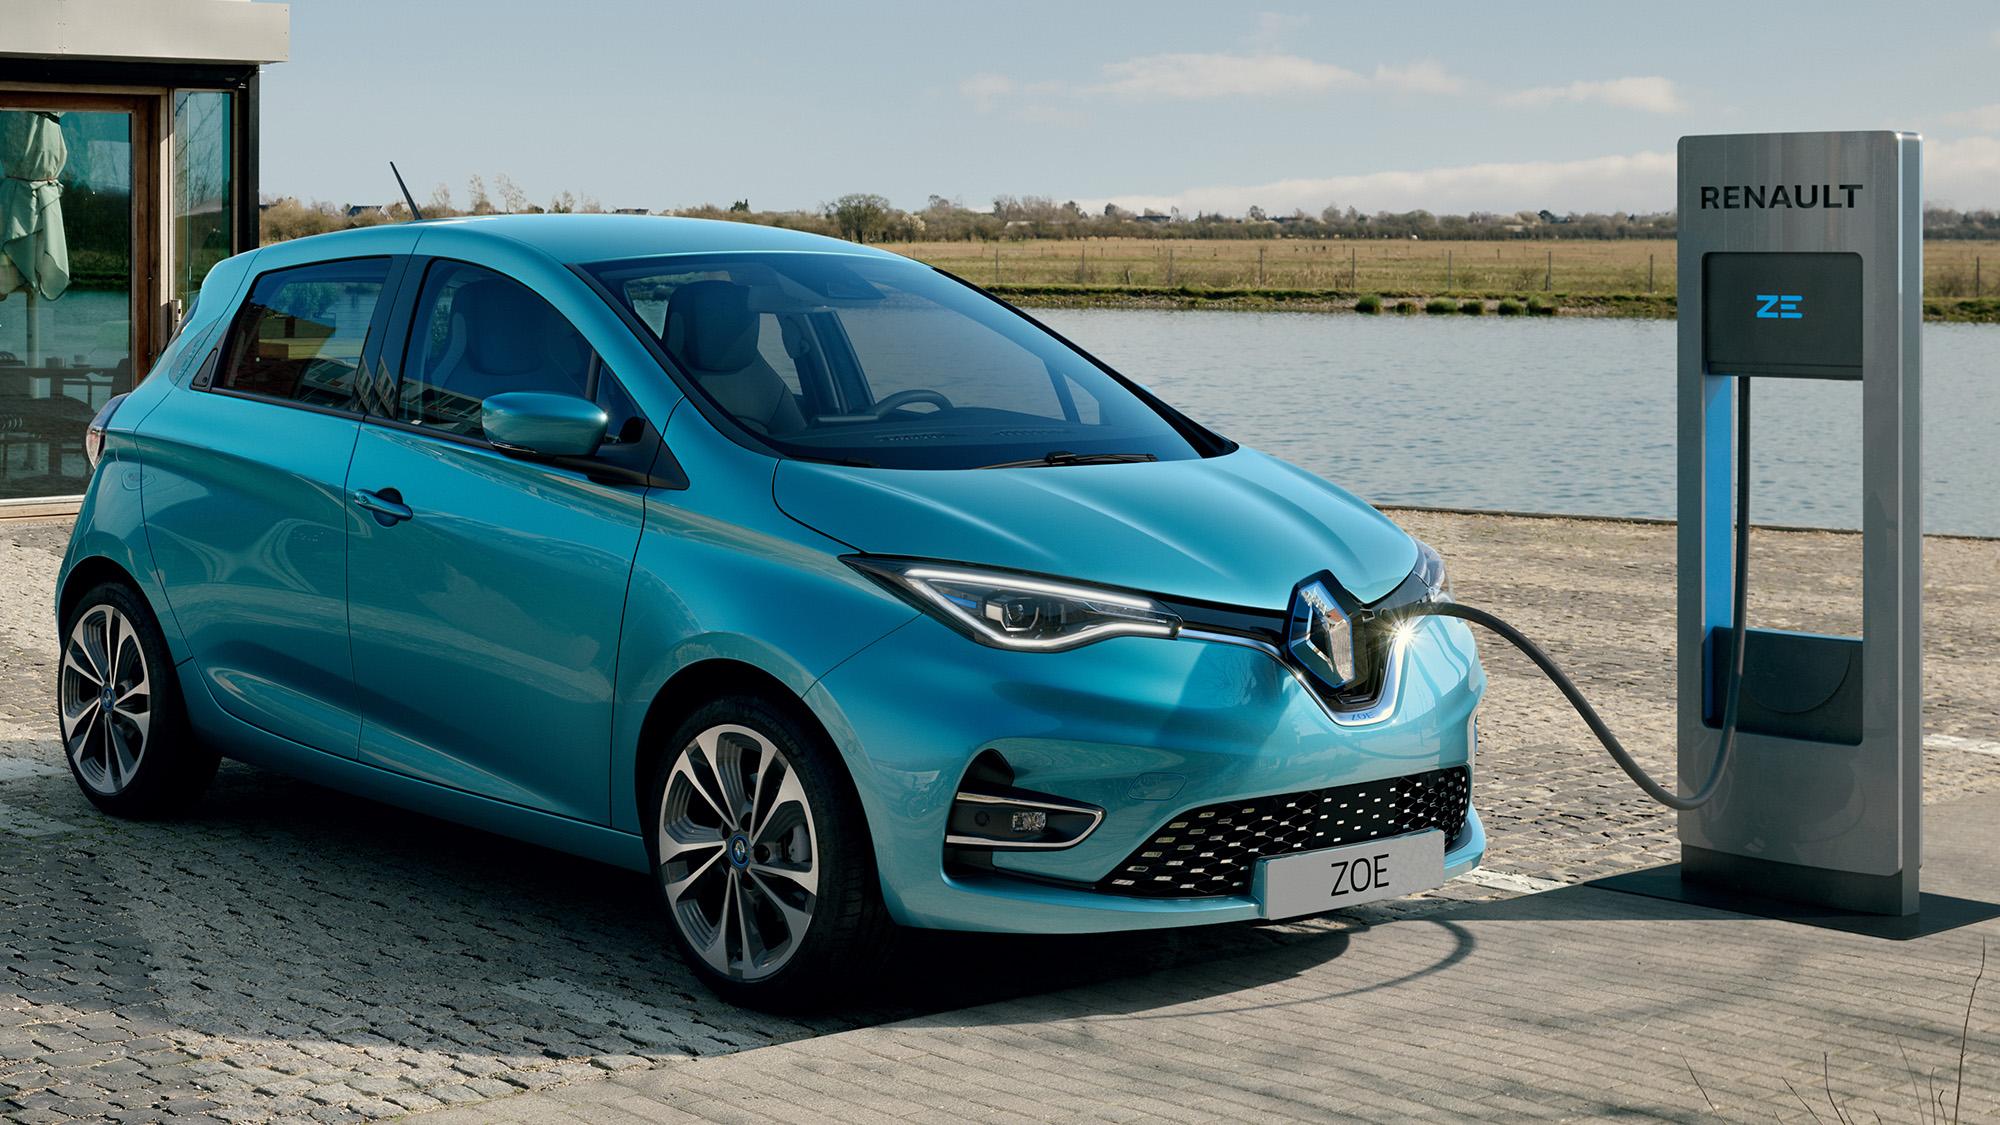 Renault Zoe azul célon